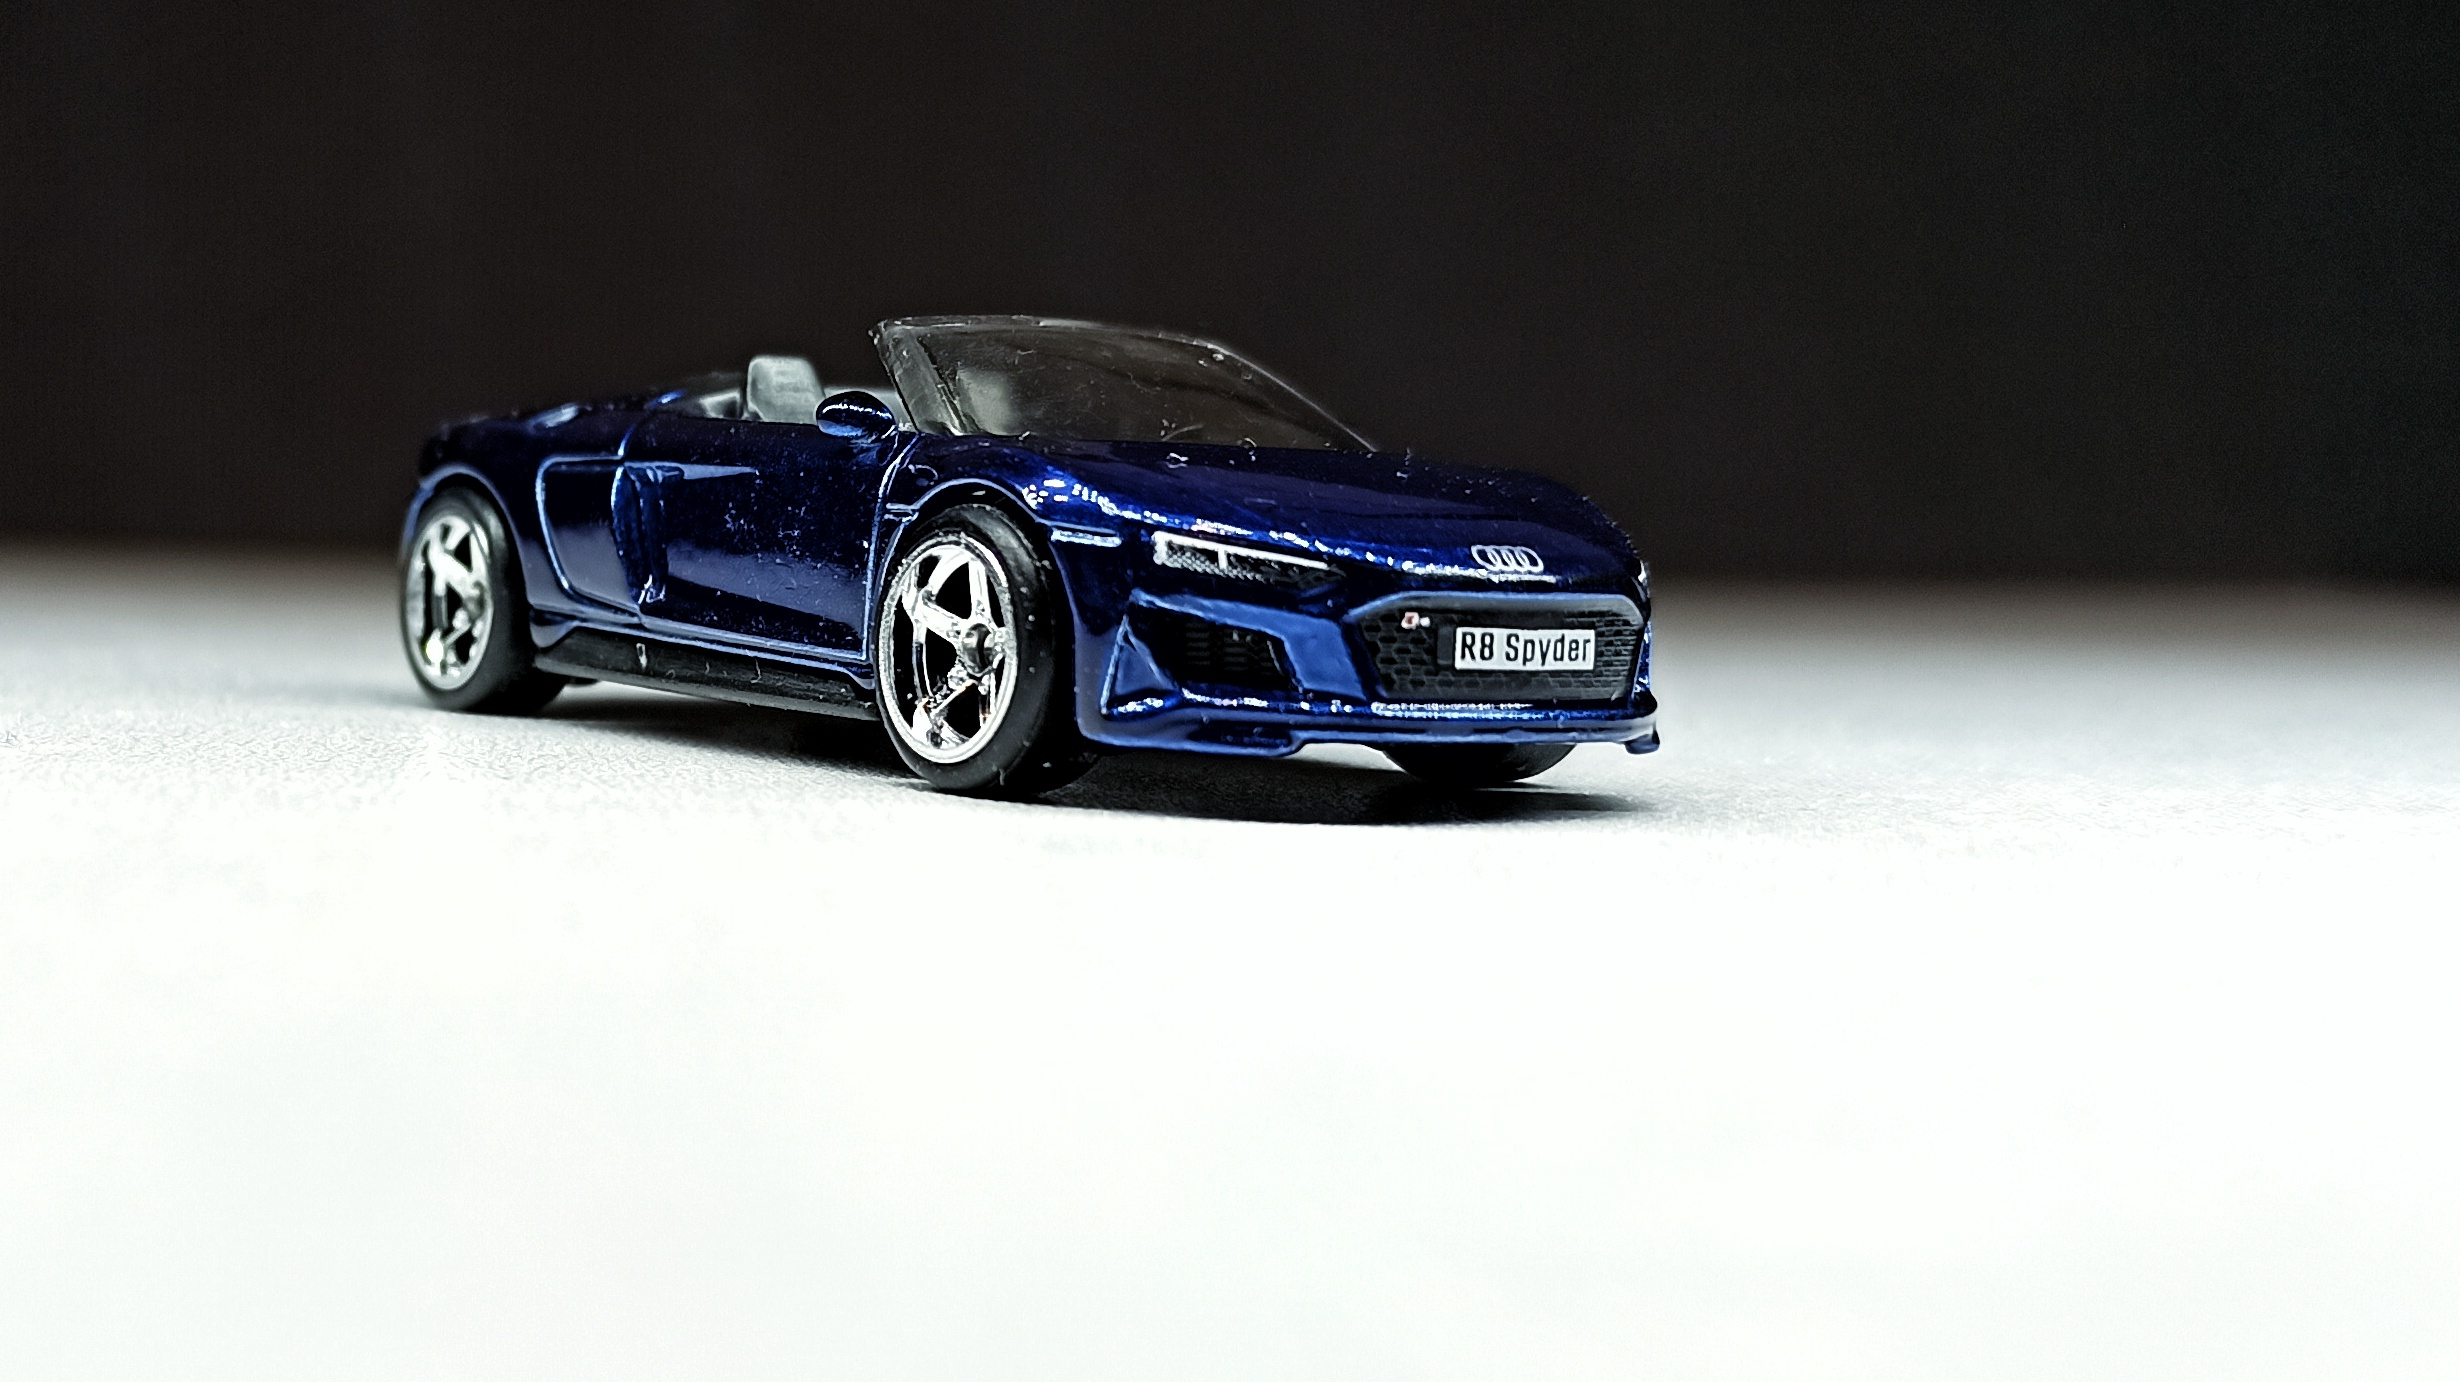 Hot Wheels 2019 Audi R8 Spyder 2021 (211/250) HW Exotics (4/10) indigo blue Super Treasure Hunt (STH) front angle